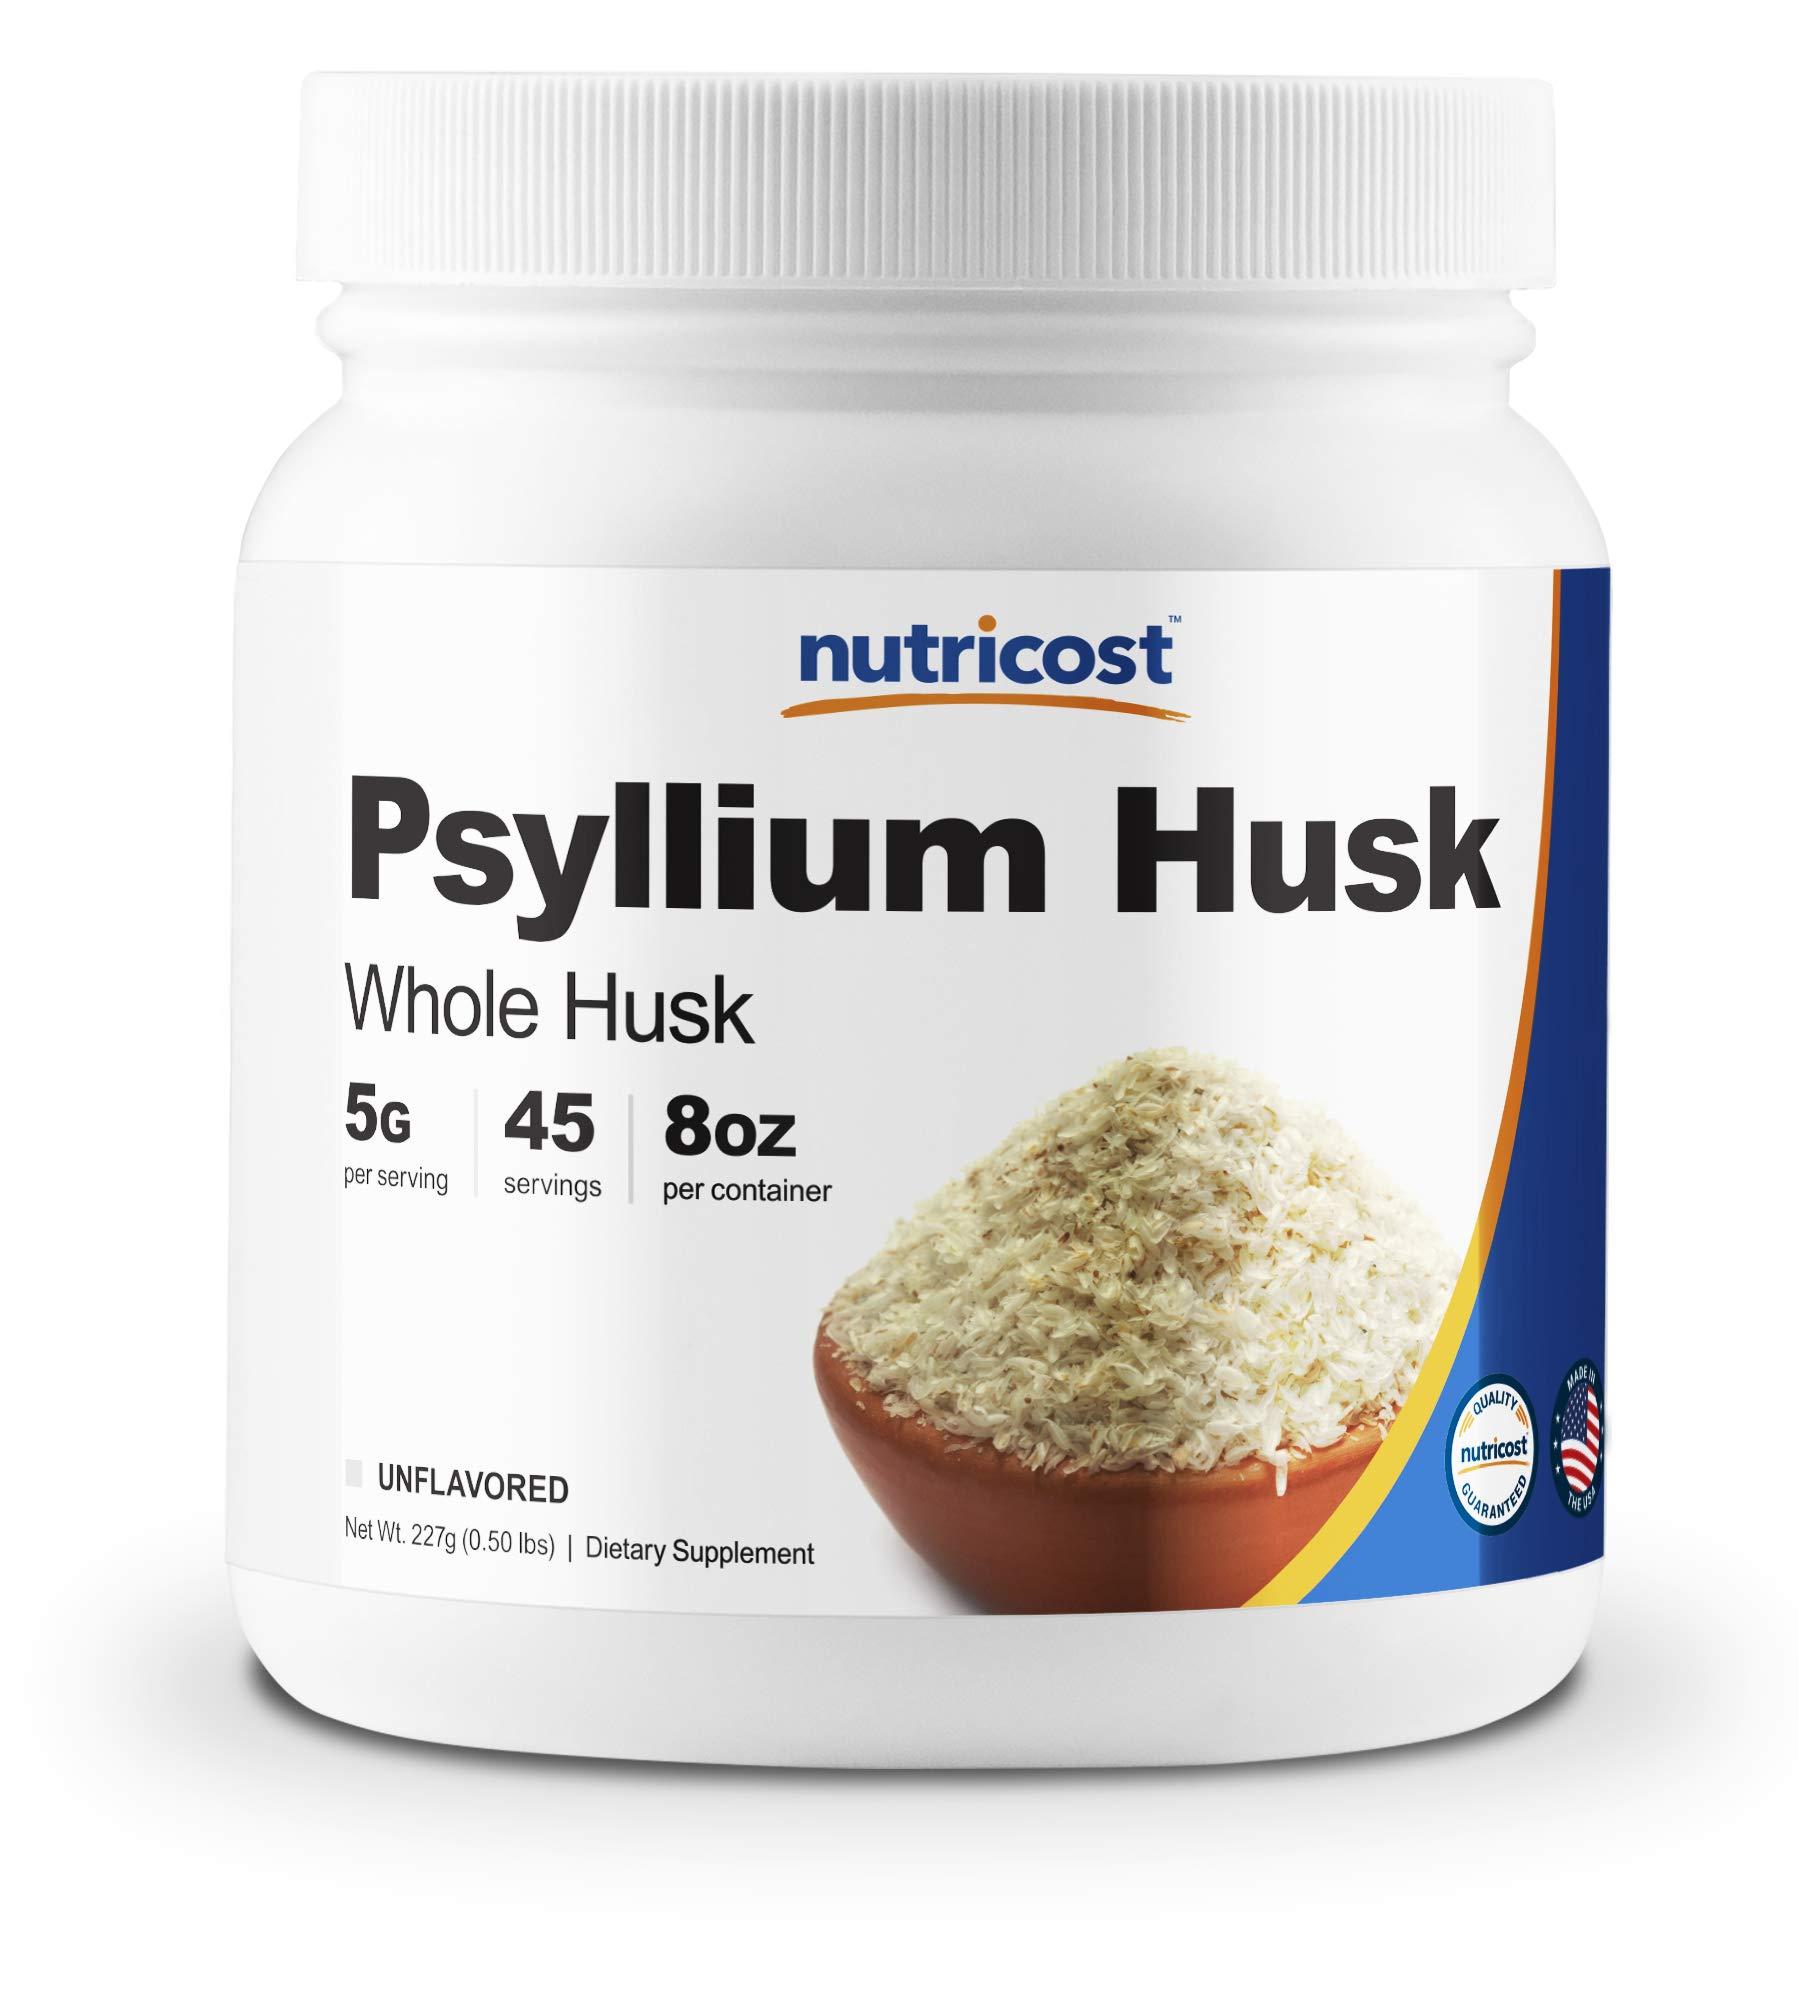 Nutricost Psyllium Whole Husk Powder (Flakes) 8oz - Gluten Free & Non-GMO by Nutricost